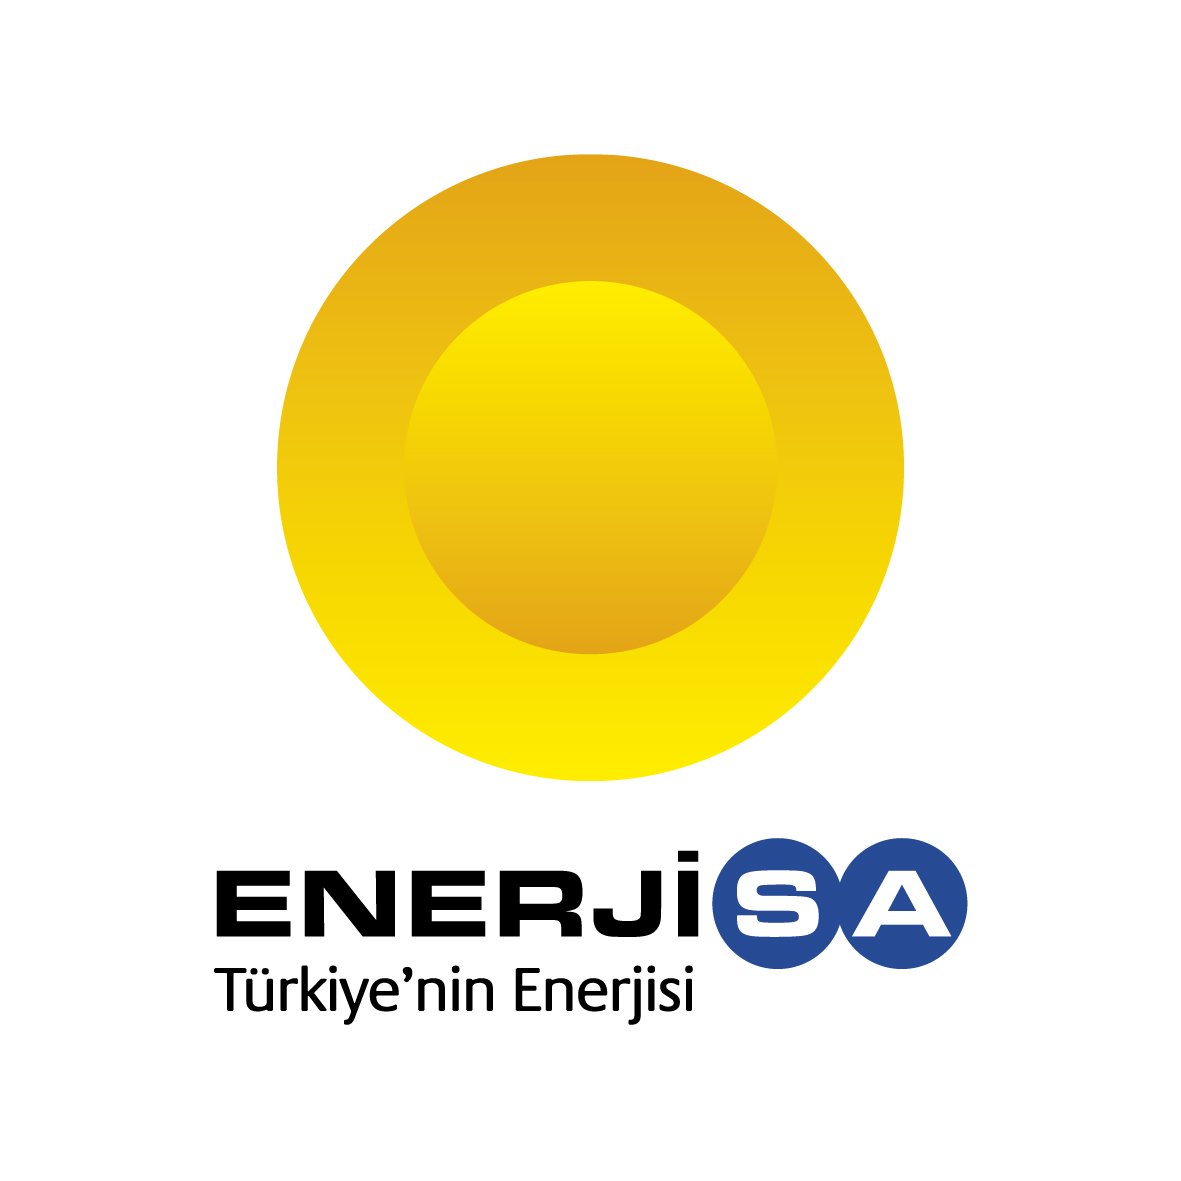 https://hacknbreak.com/wp-content/uploads/2016/07/enerjisa-logo-ing-01.jpg